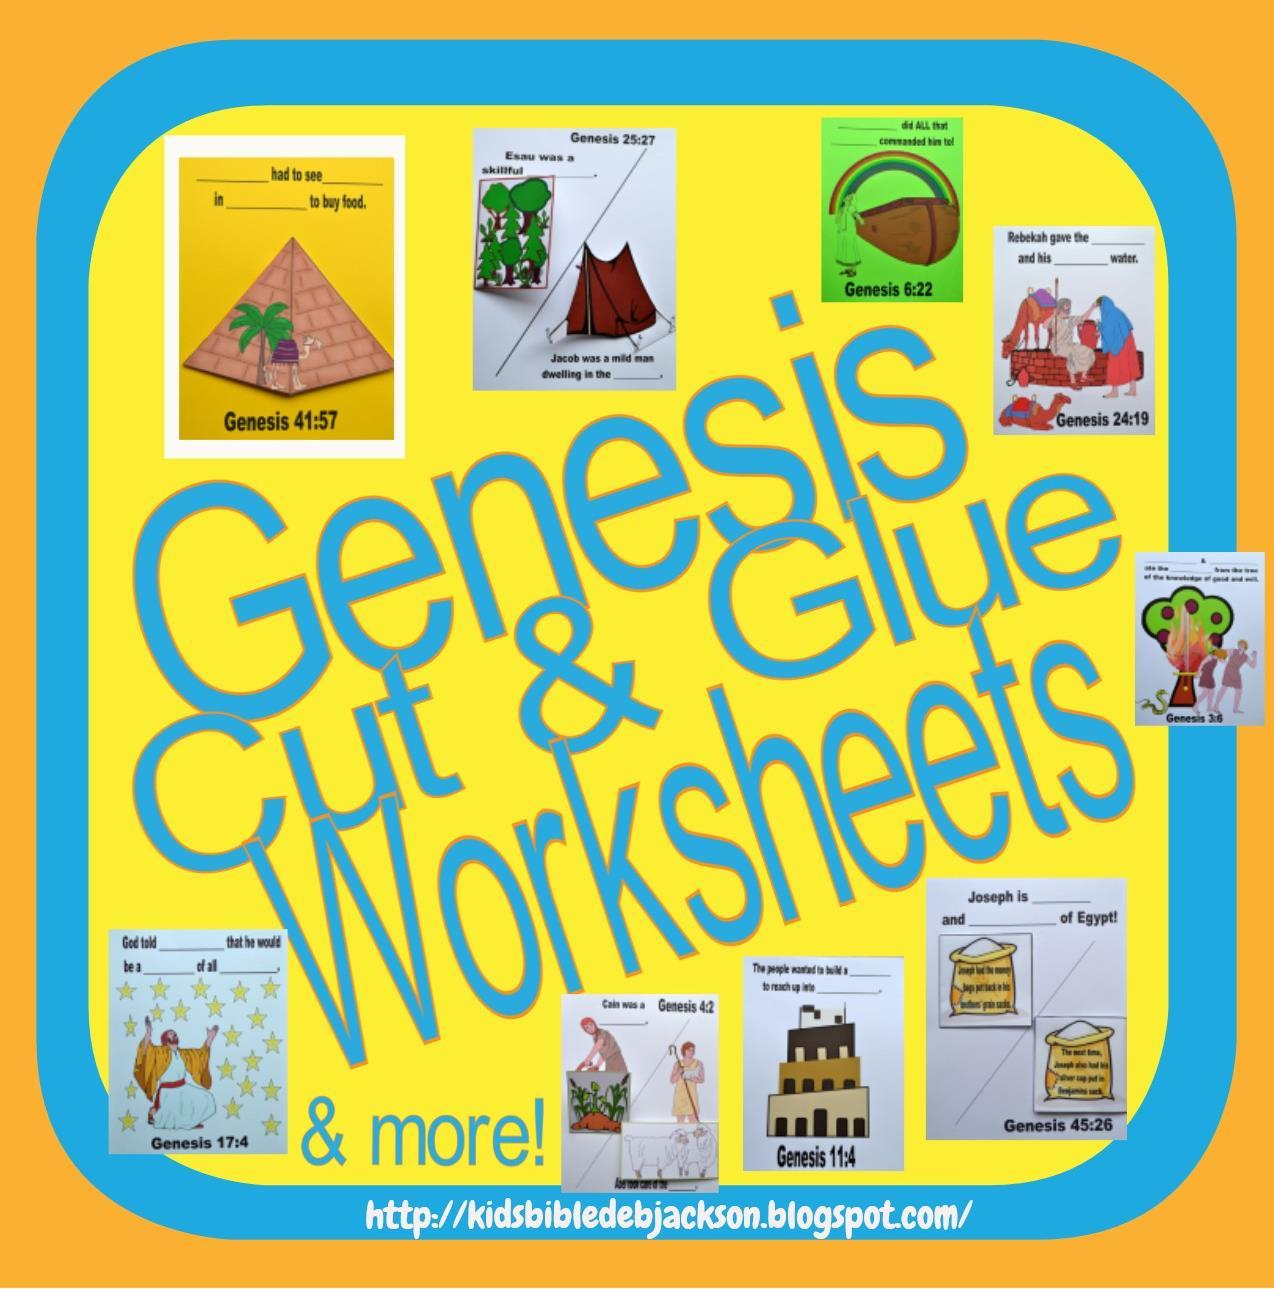 worksheet Creation Worksheets Ks2 bible fun for kids genesis series creation www biblefunforkids com